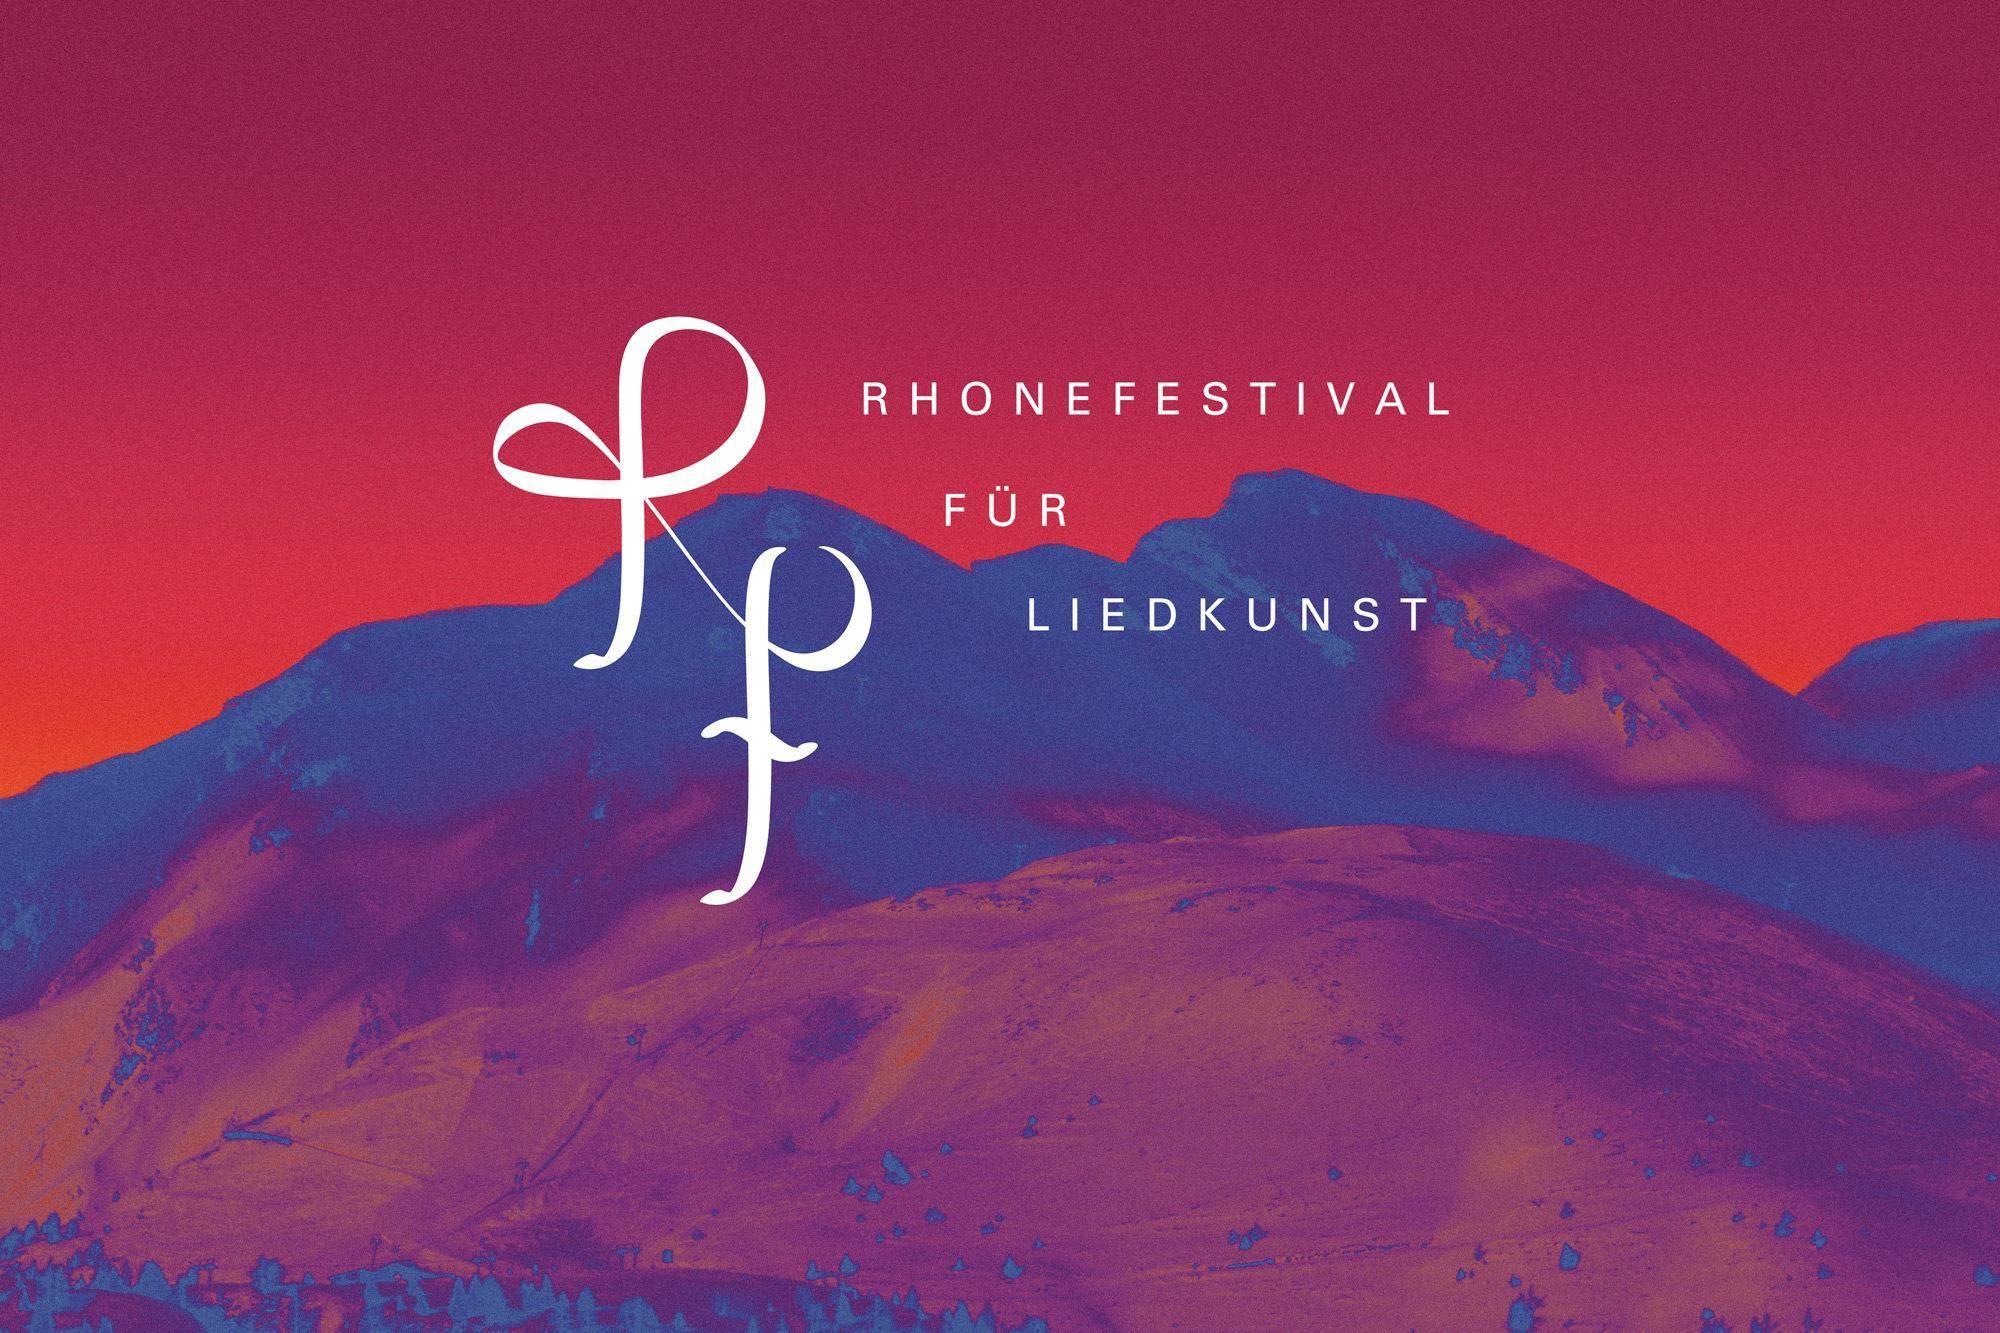 Rhonefestival